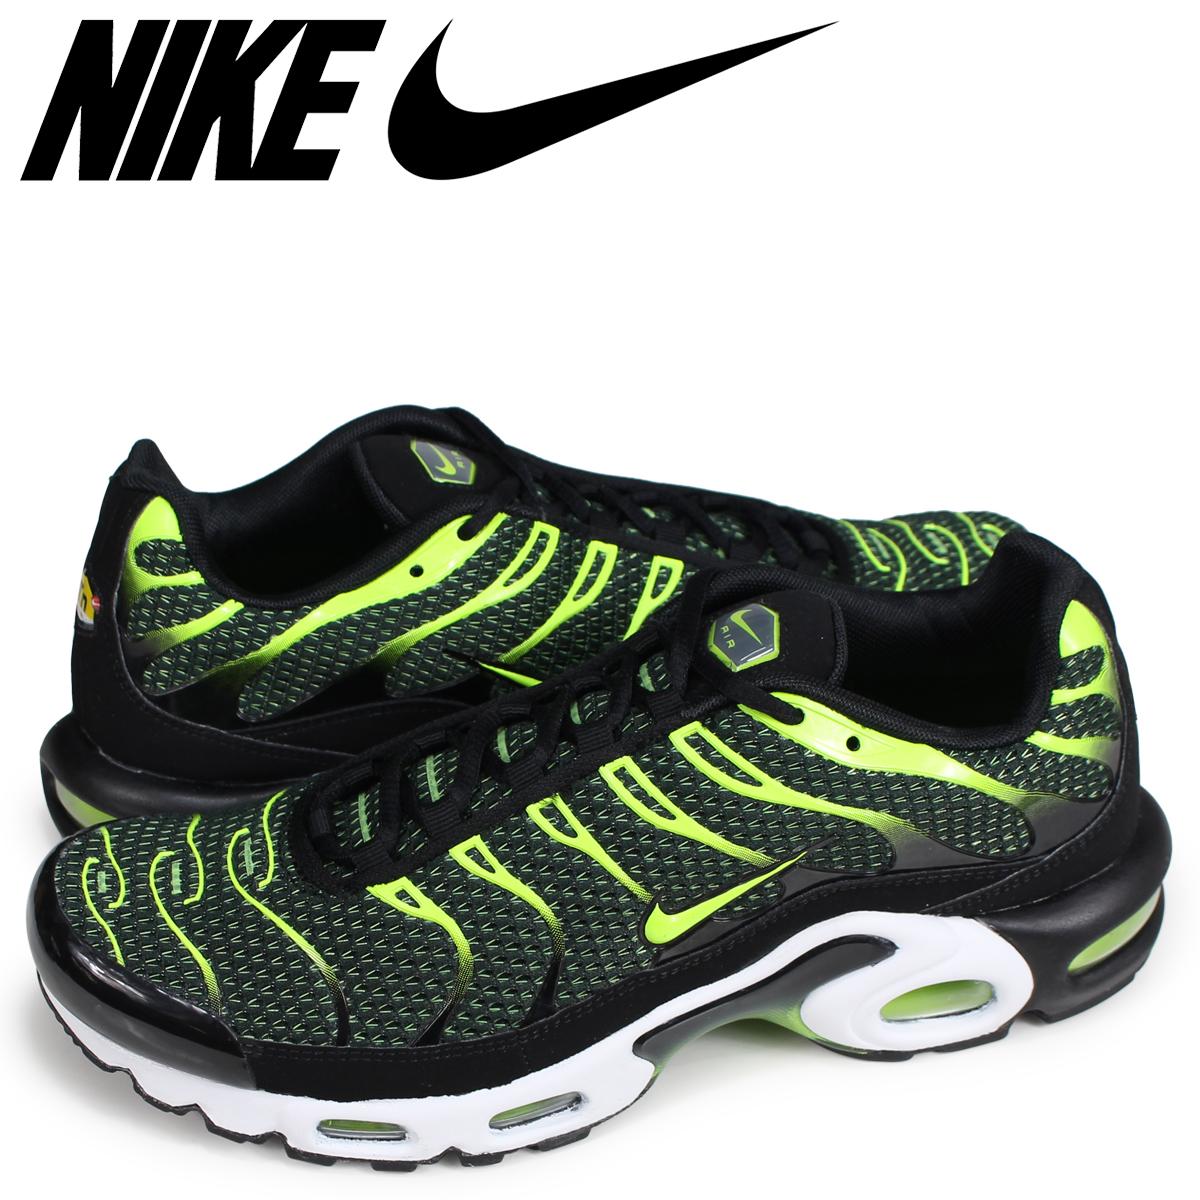 promo code f437e d8407 NIKE AIR MAX PLUS Kie Ney AMAX plus sneakers men black 852,630-036